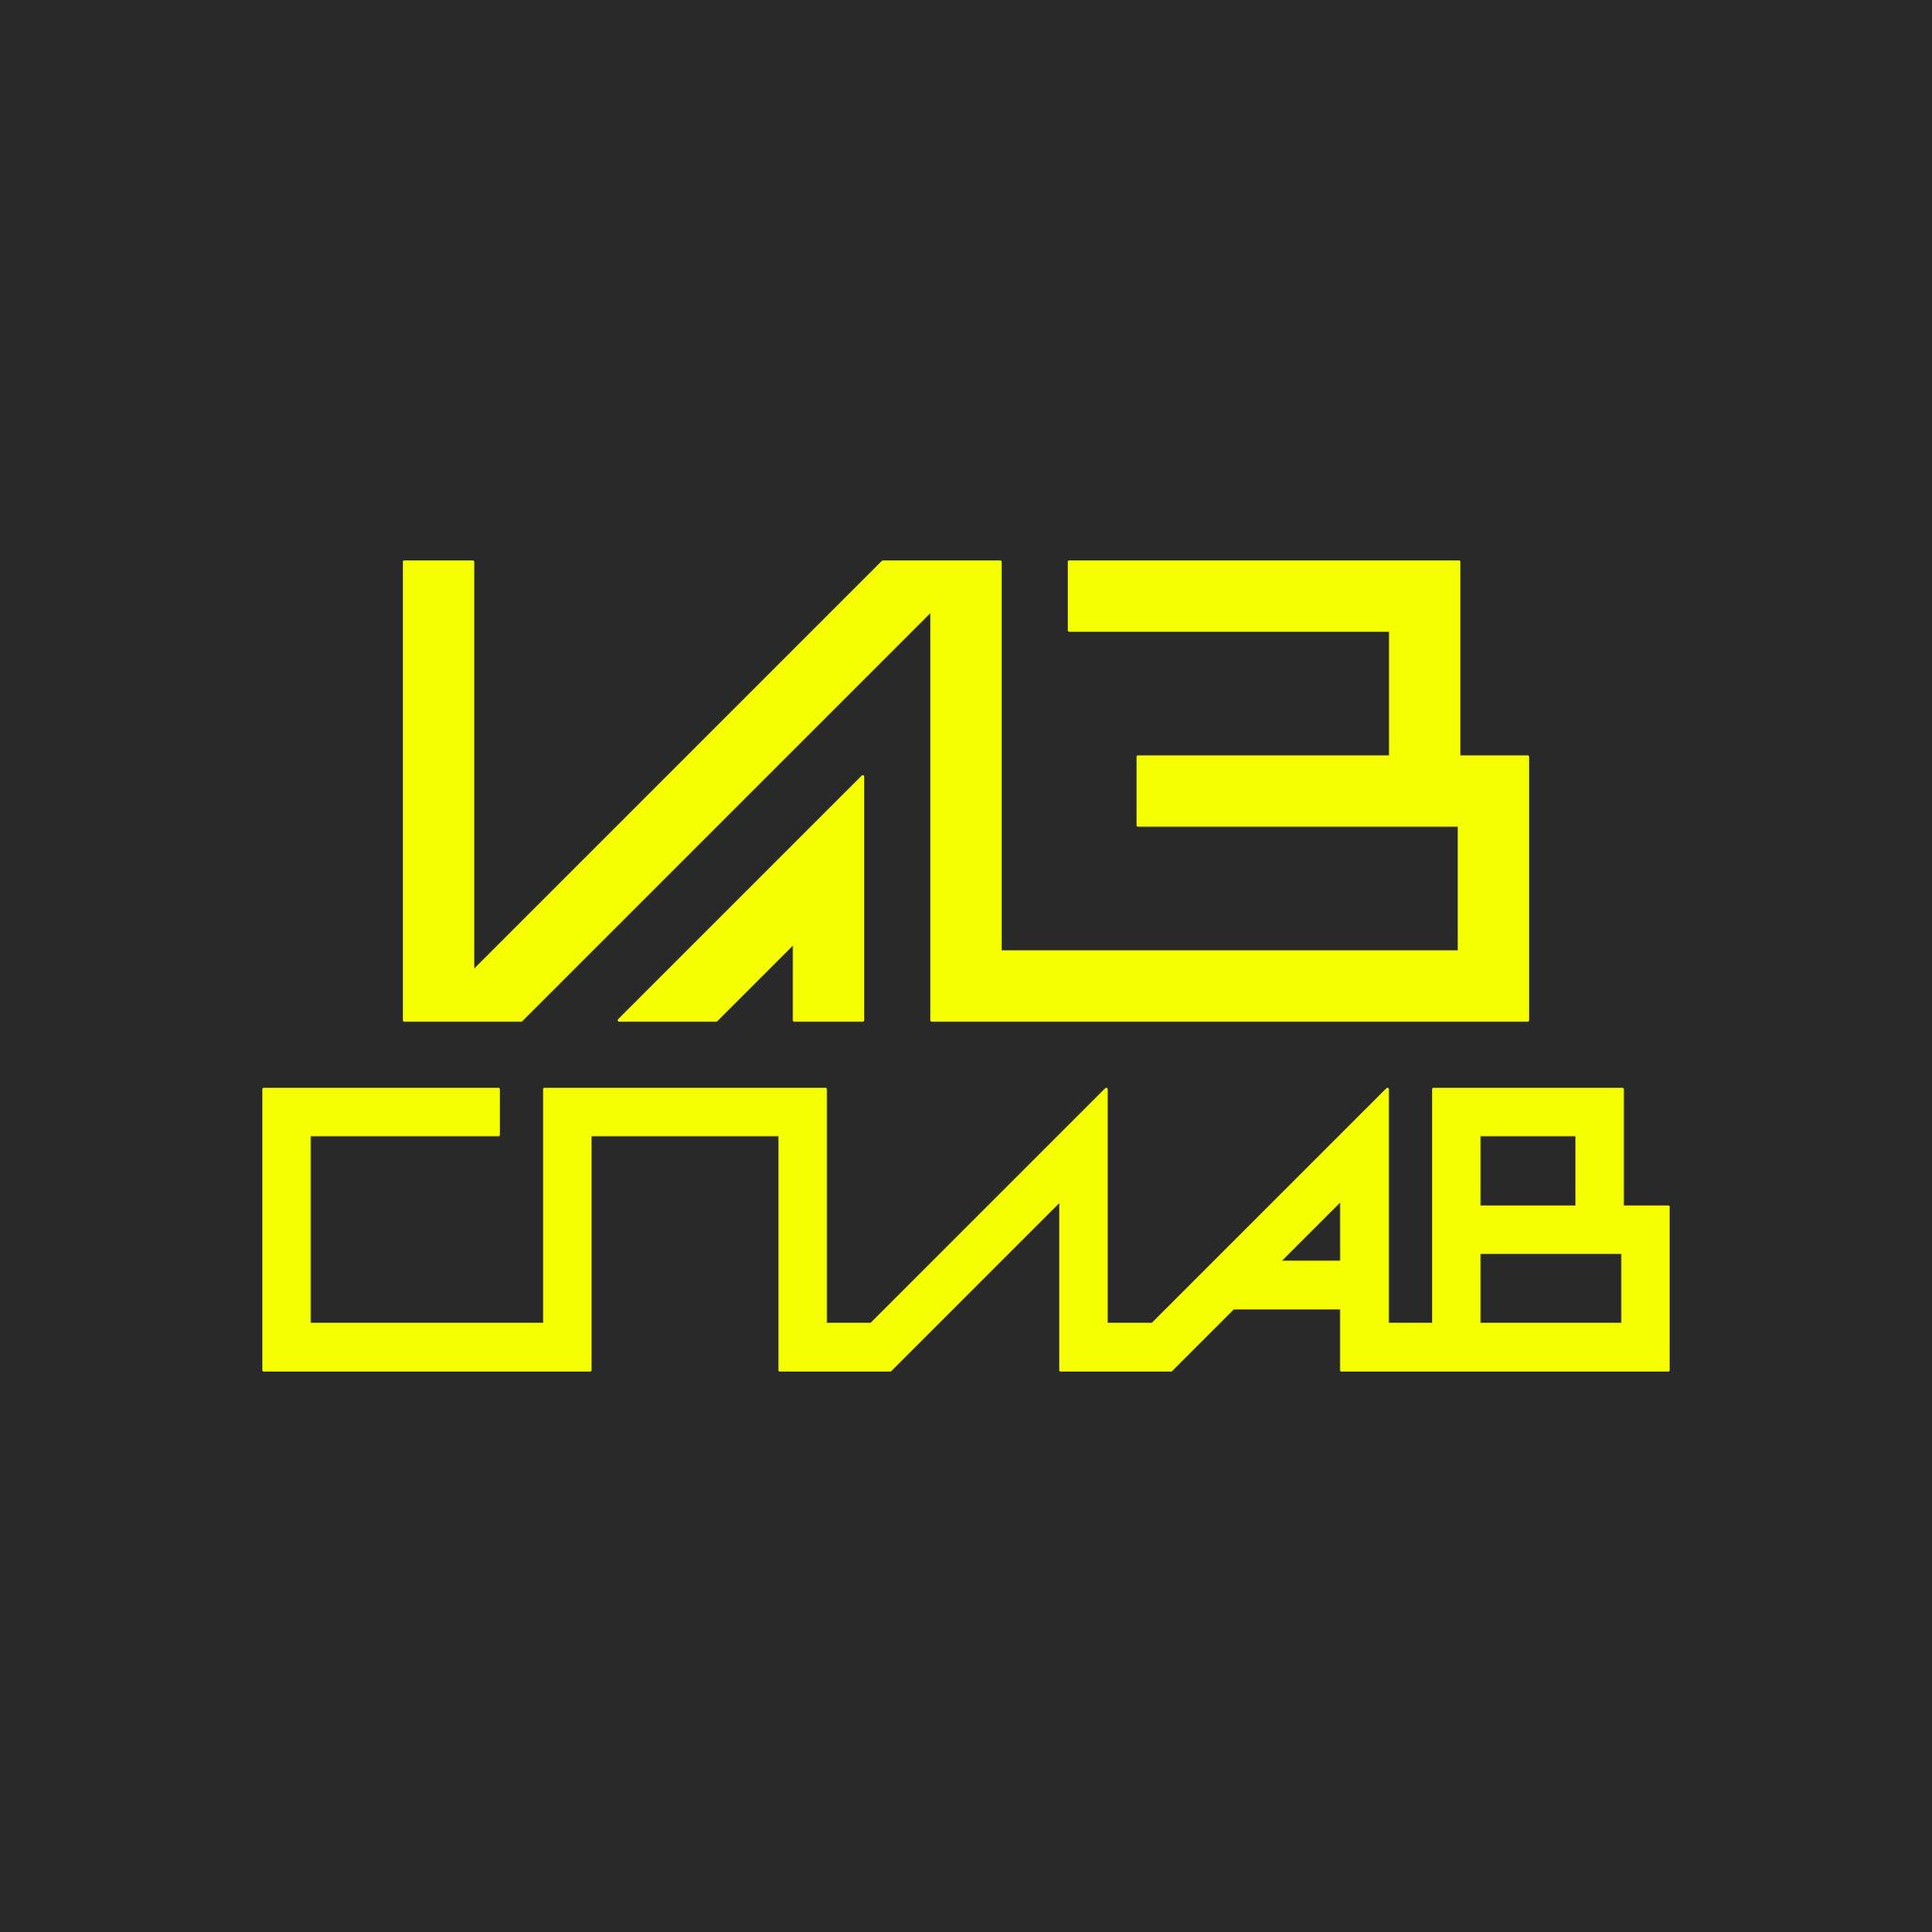 Разработать логотип для литейного завода фото f_0935af954f92ce4b.png